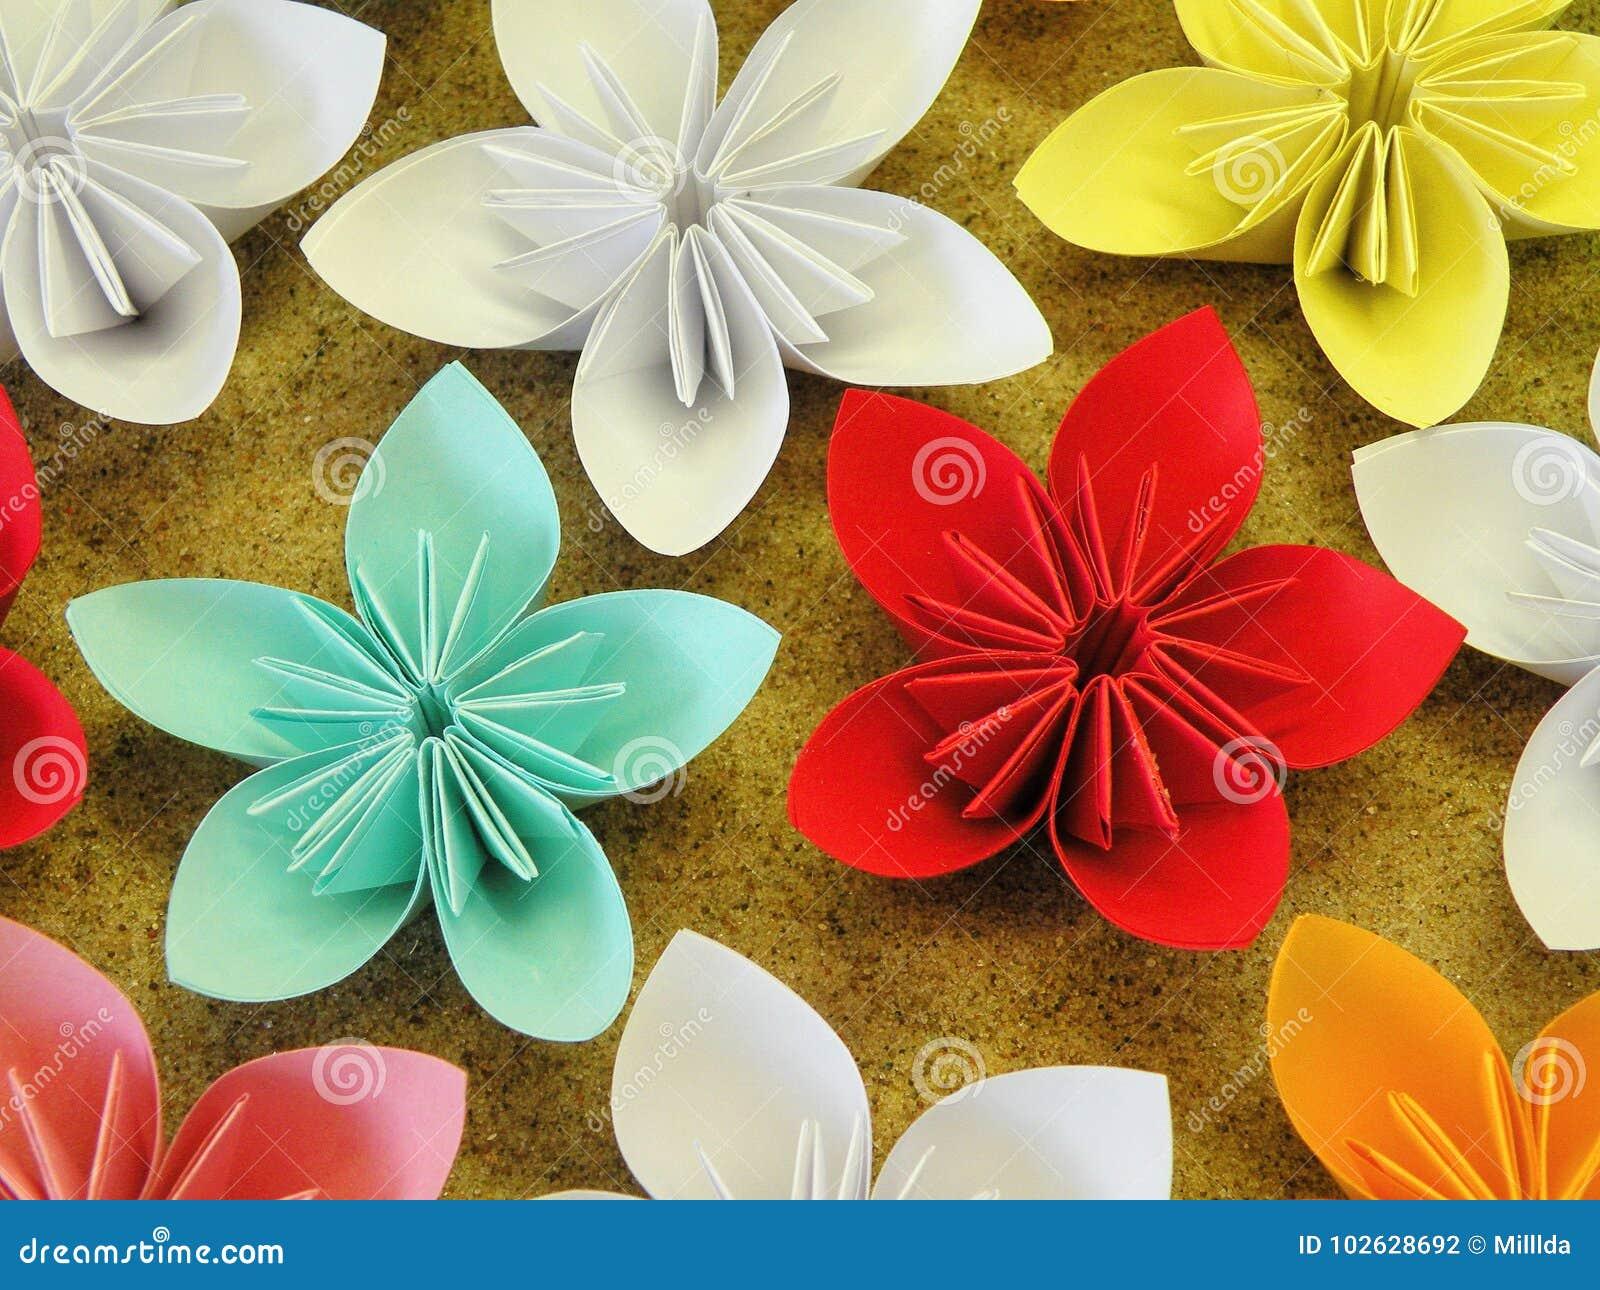 Colorful origami flowers stock photo image of white 102628692 download colorful origami flowers stock photo image of white 102628692 mightylinksfo